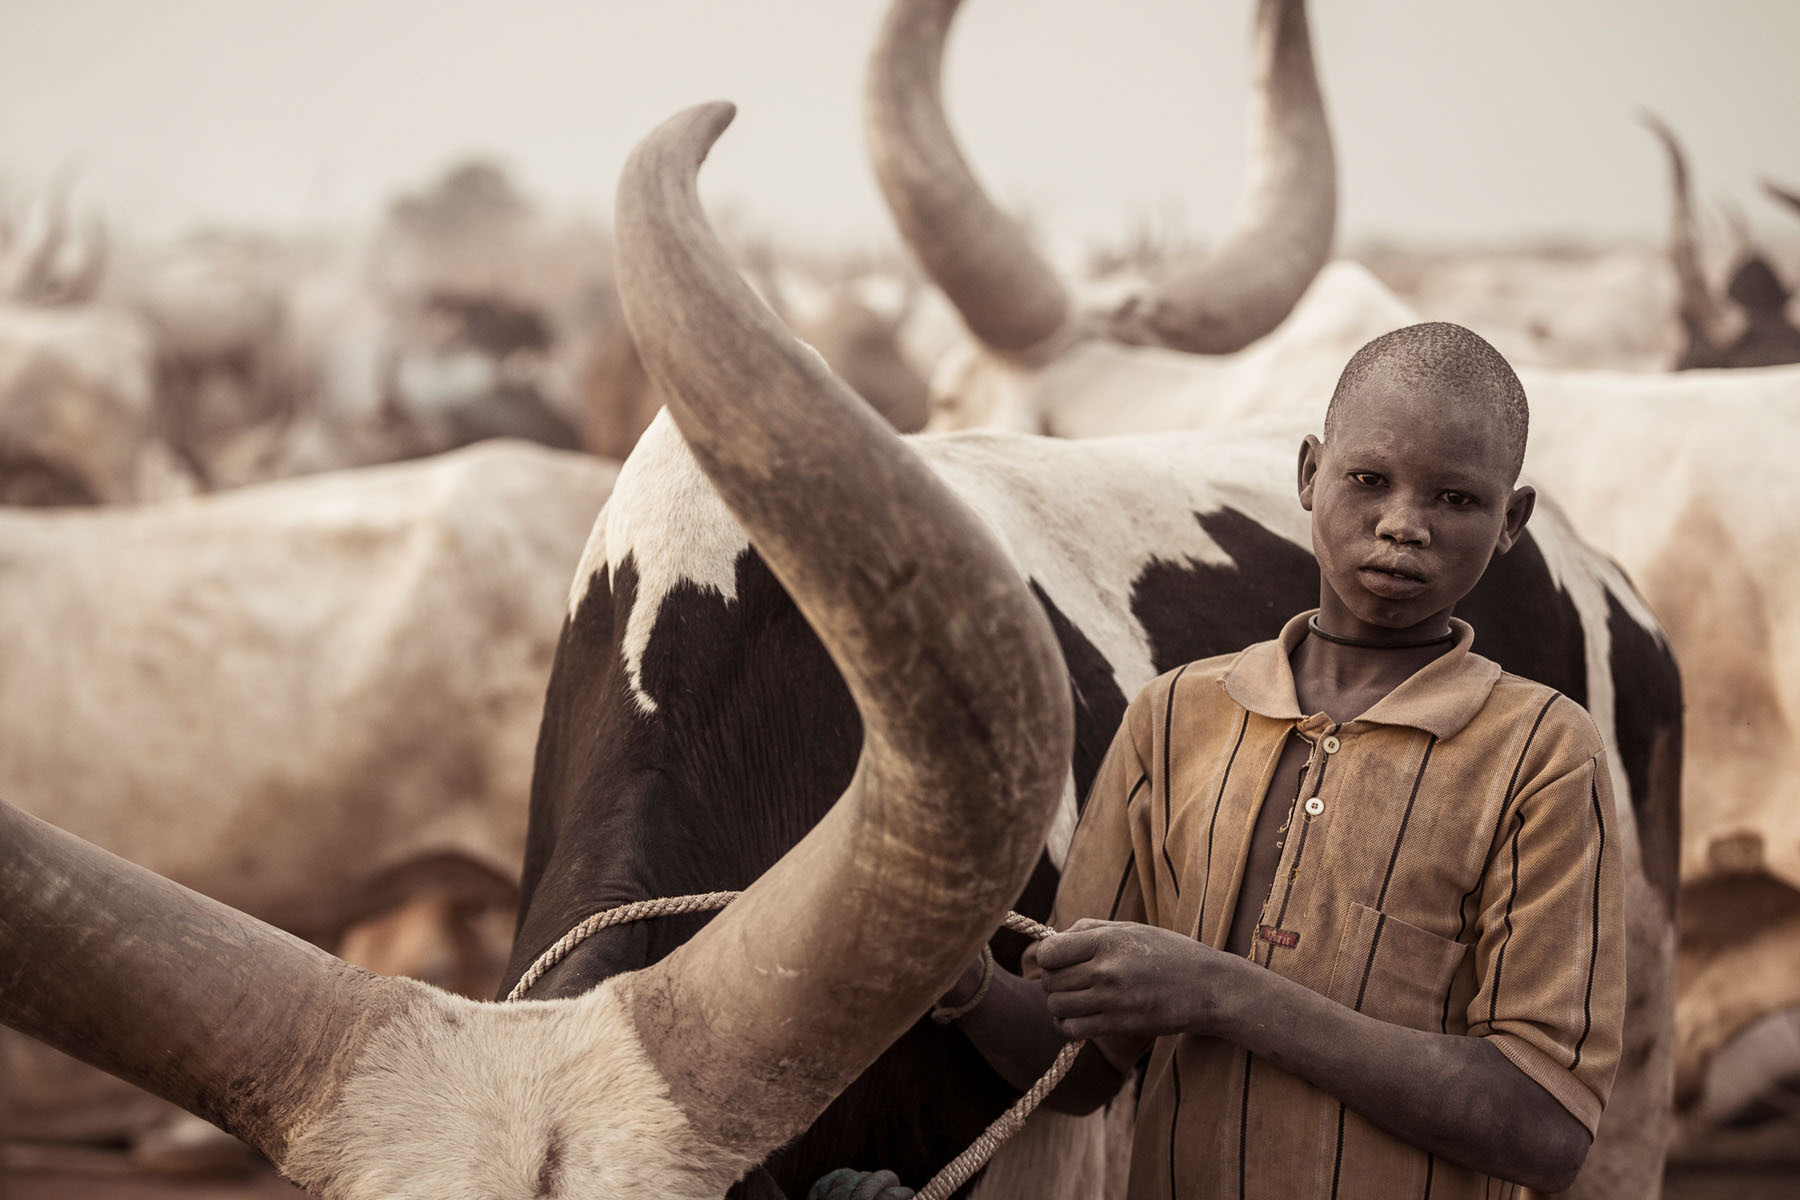 A young Mundari taking care of his cow © Joe Buergi